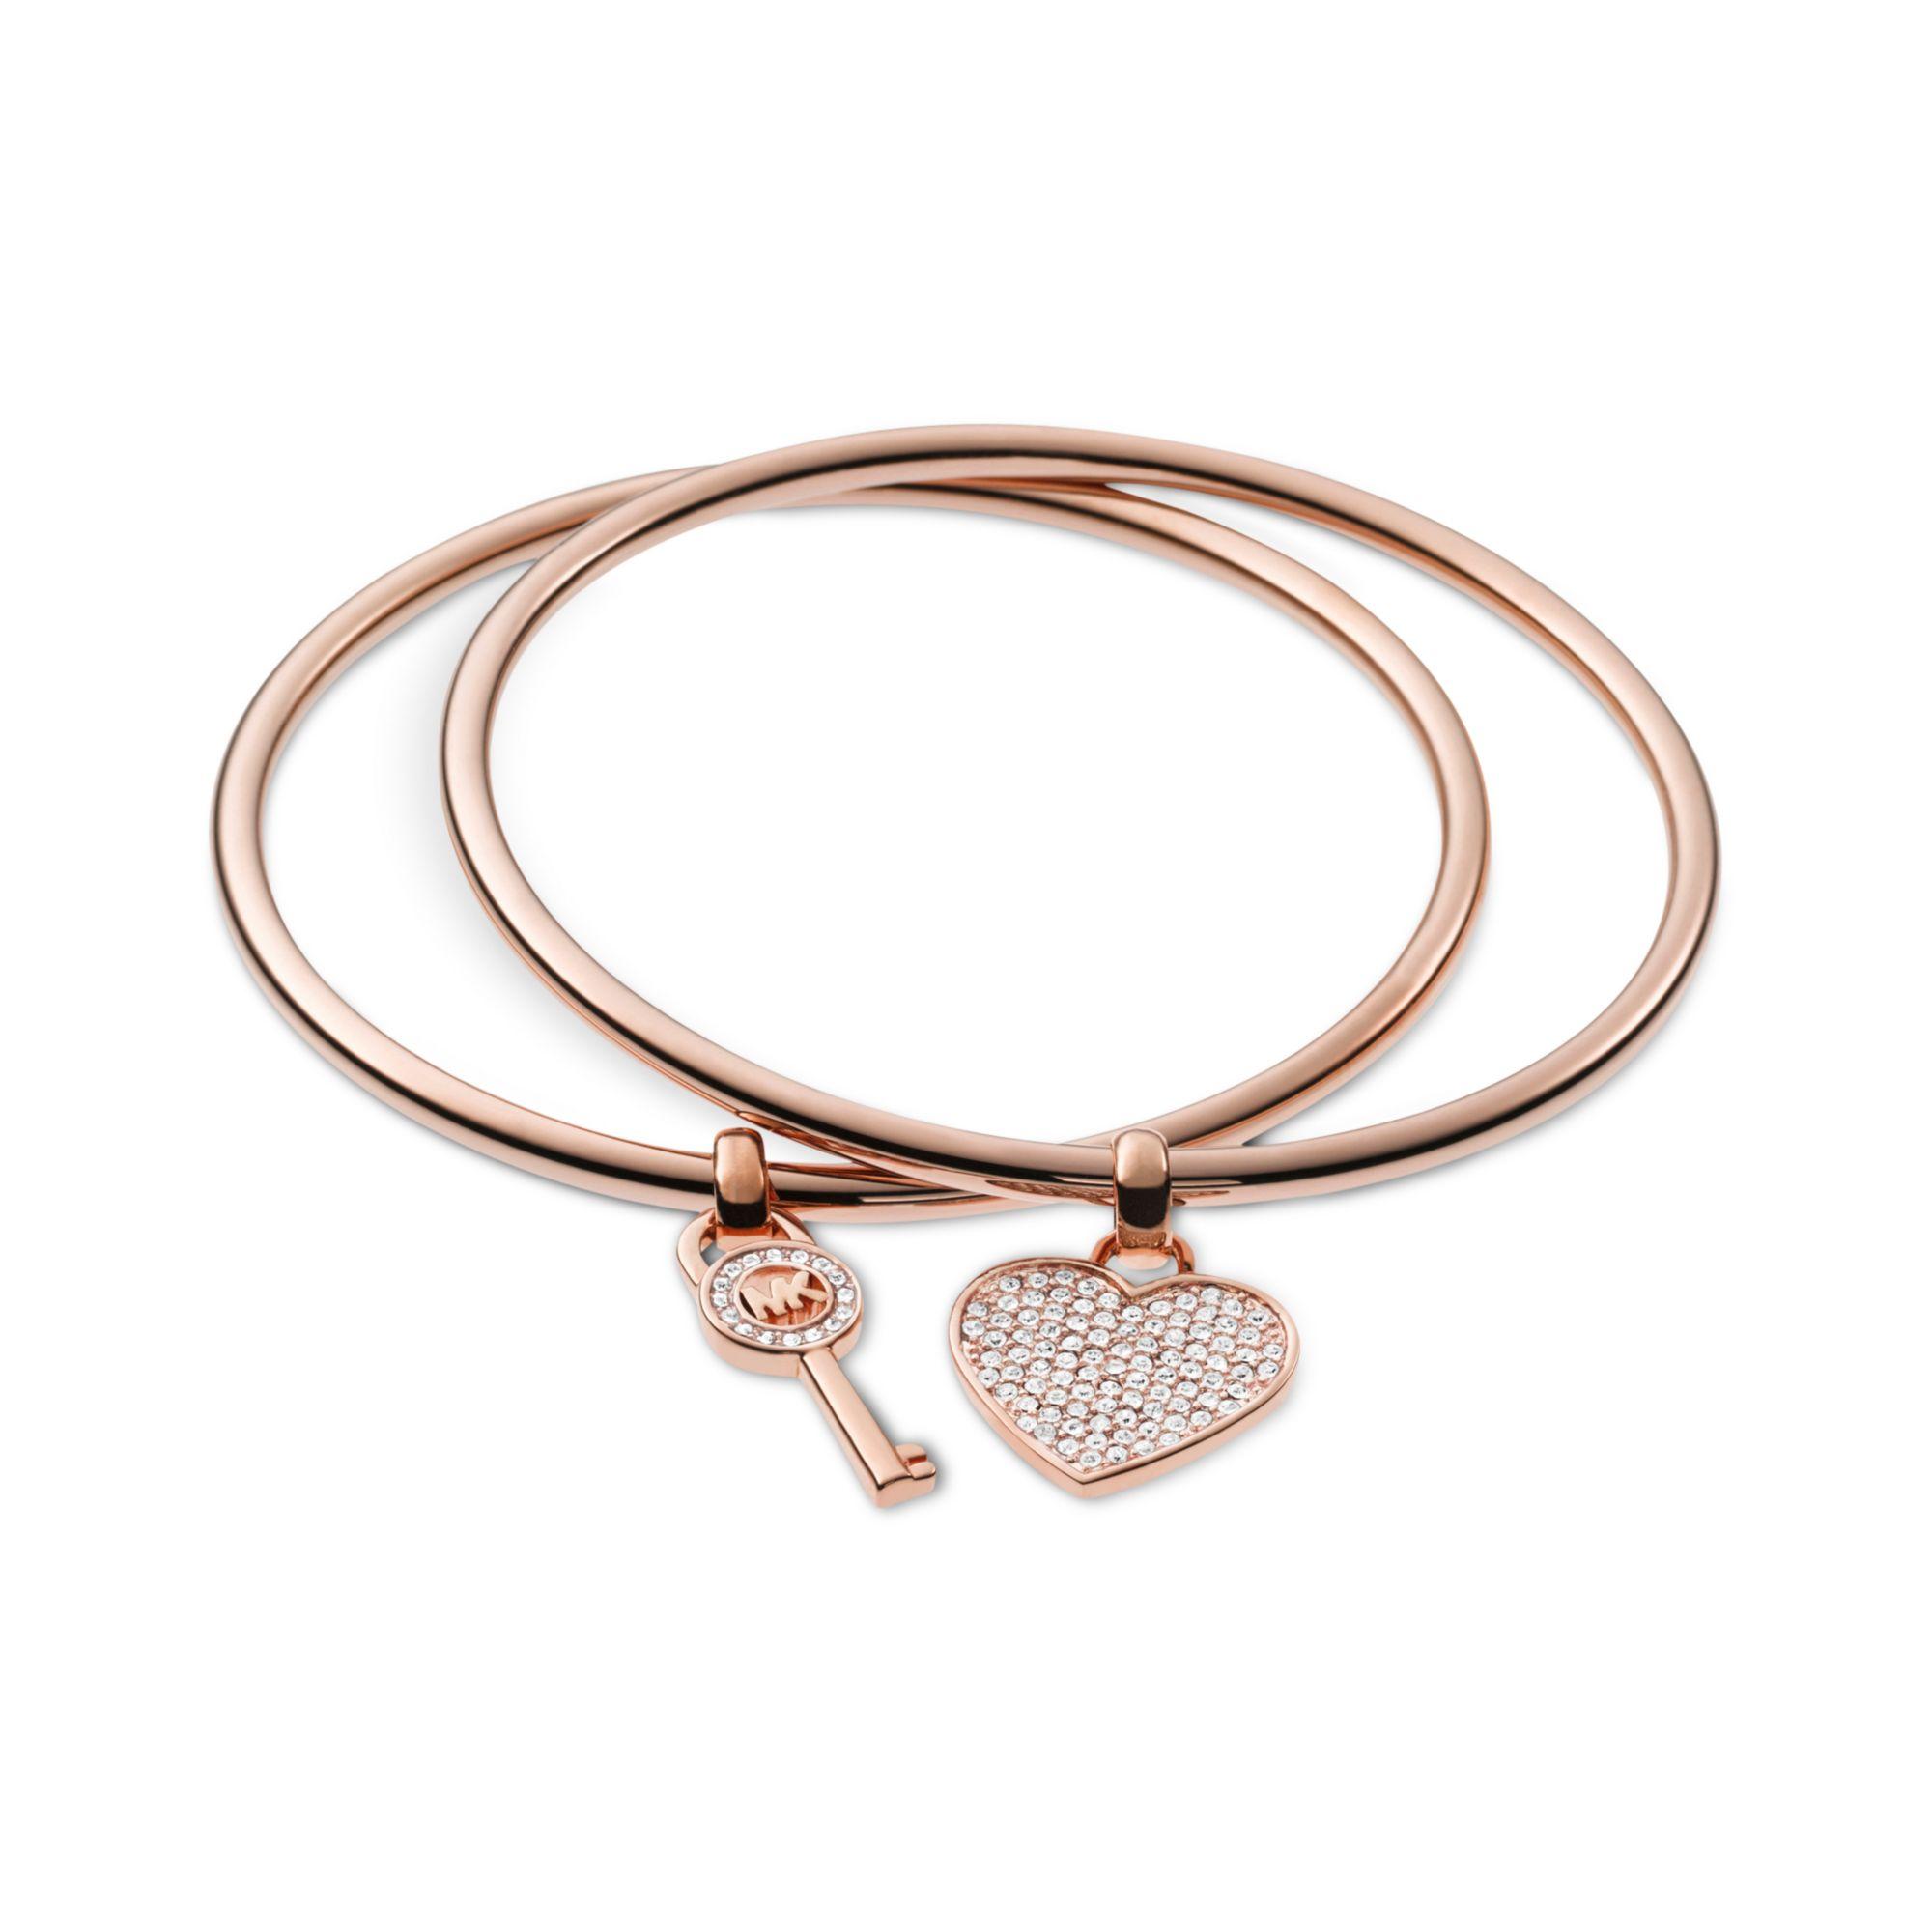 Michael kors Silvertone Heart and Key Charm Bangle Bracelets in